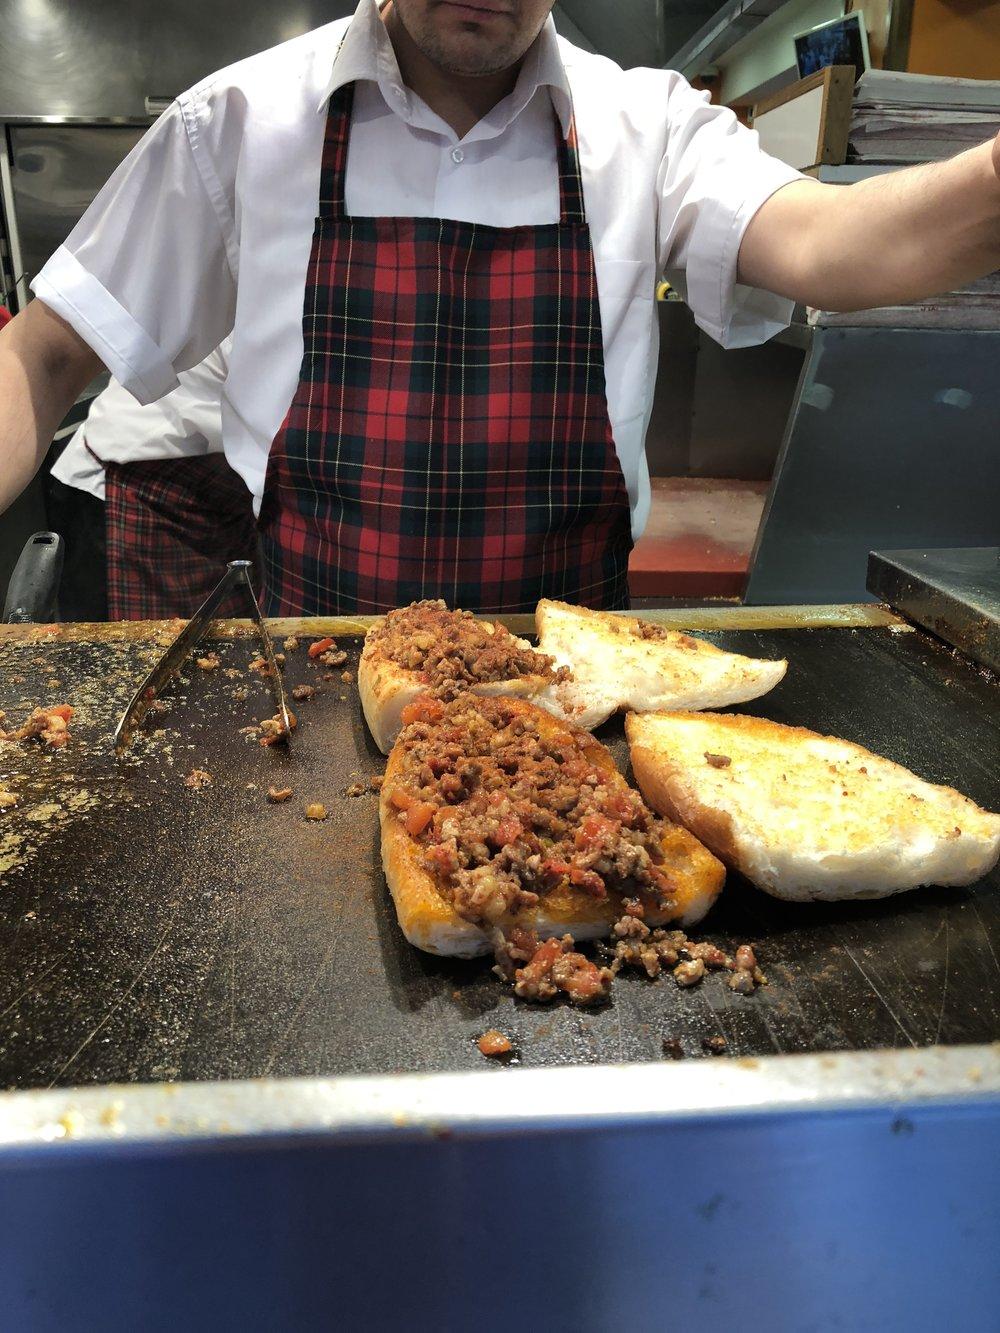 thetravelhub_istanbul_food 01.JPG